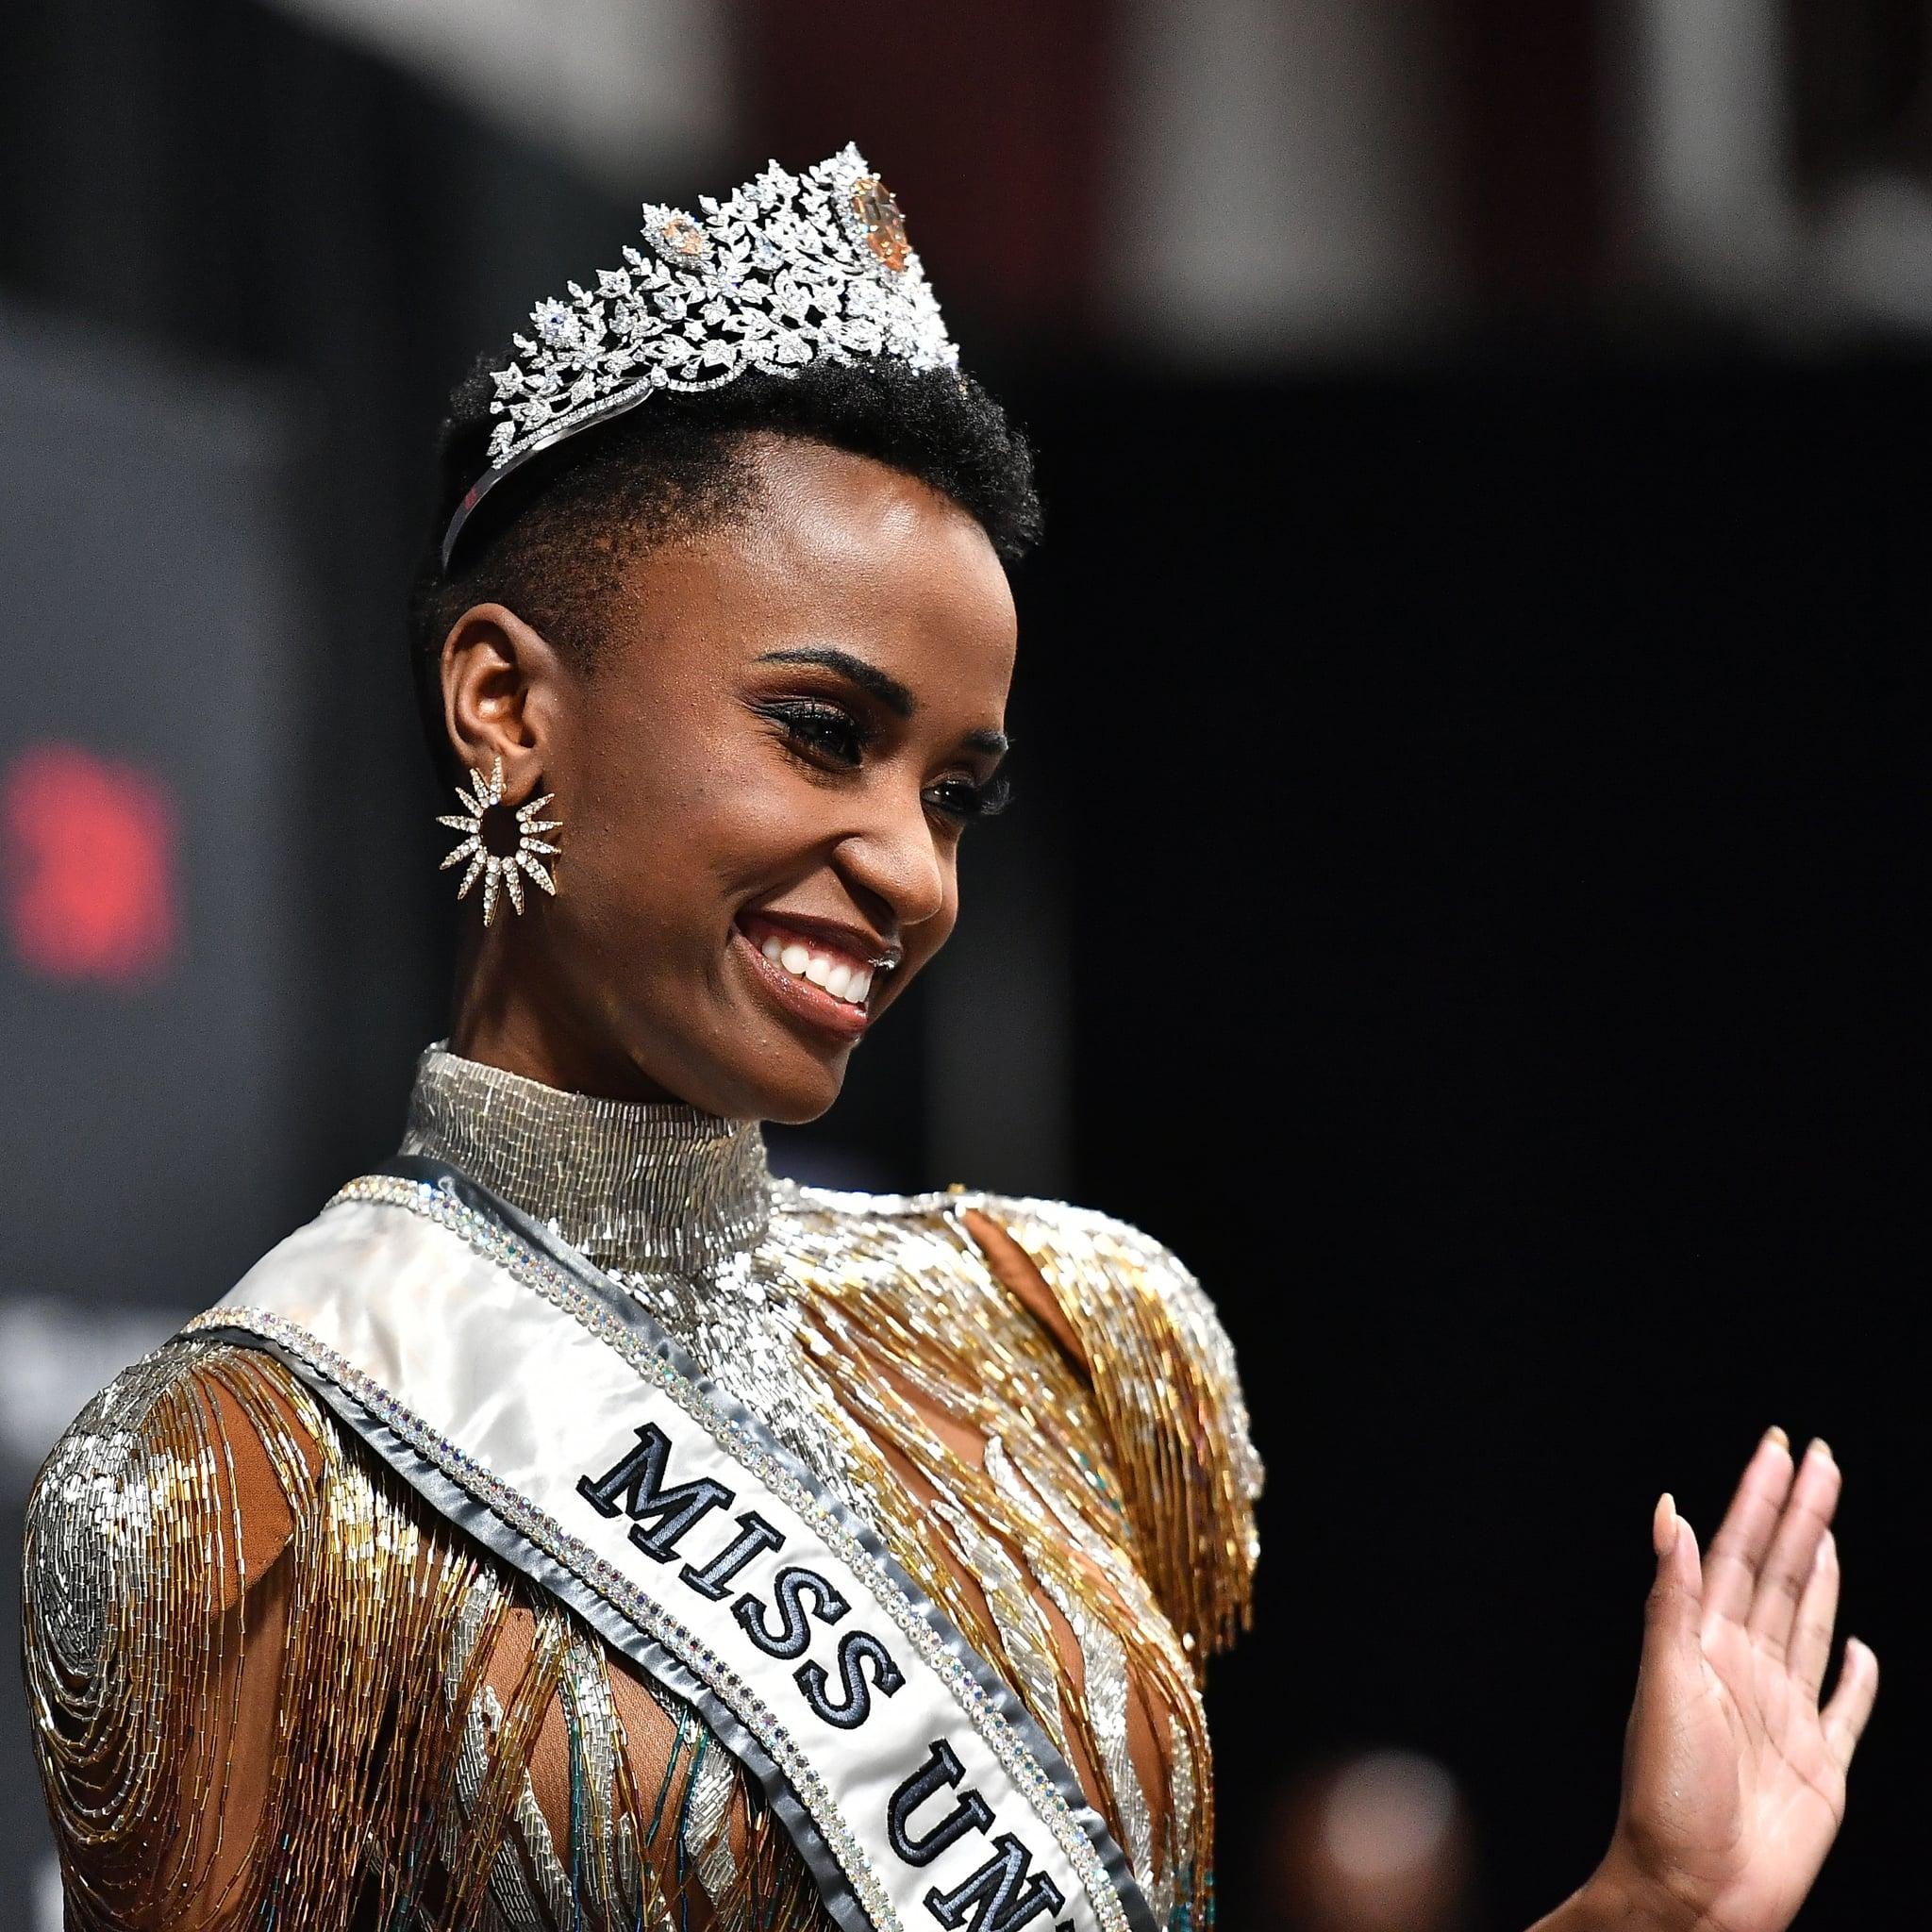 Who Is Miss Universe South Africa 2019 Zozibini Tunzi   POPSUGAR Celebrity Australia